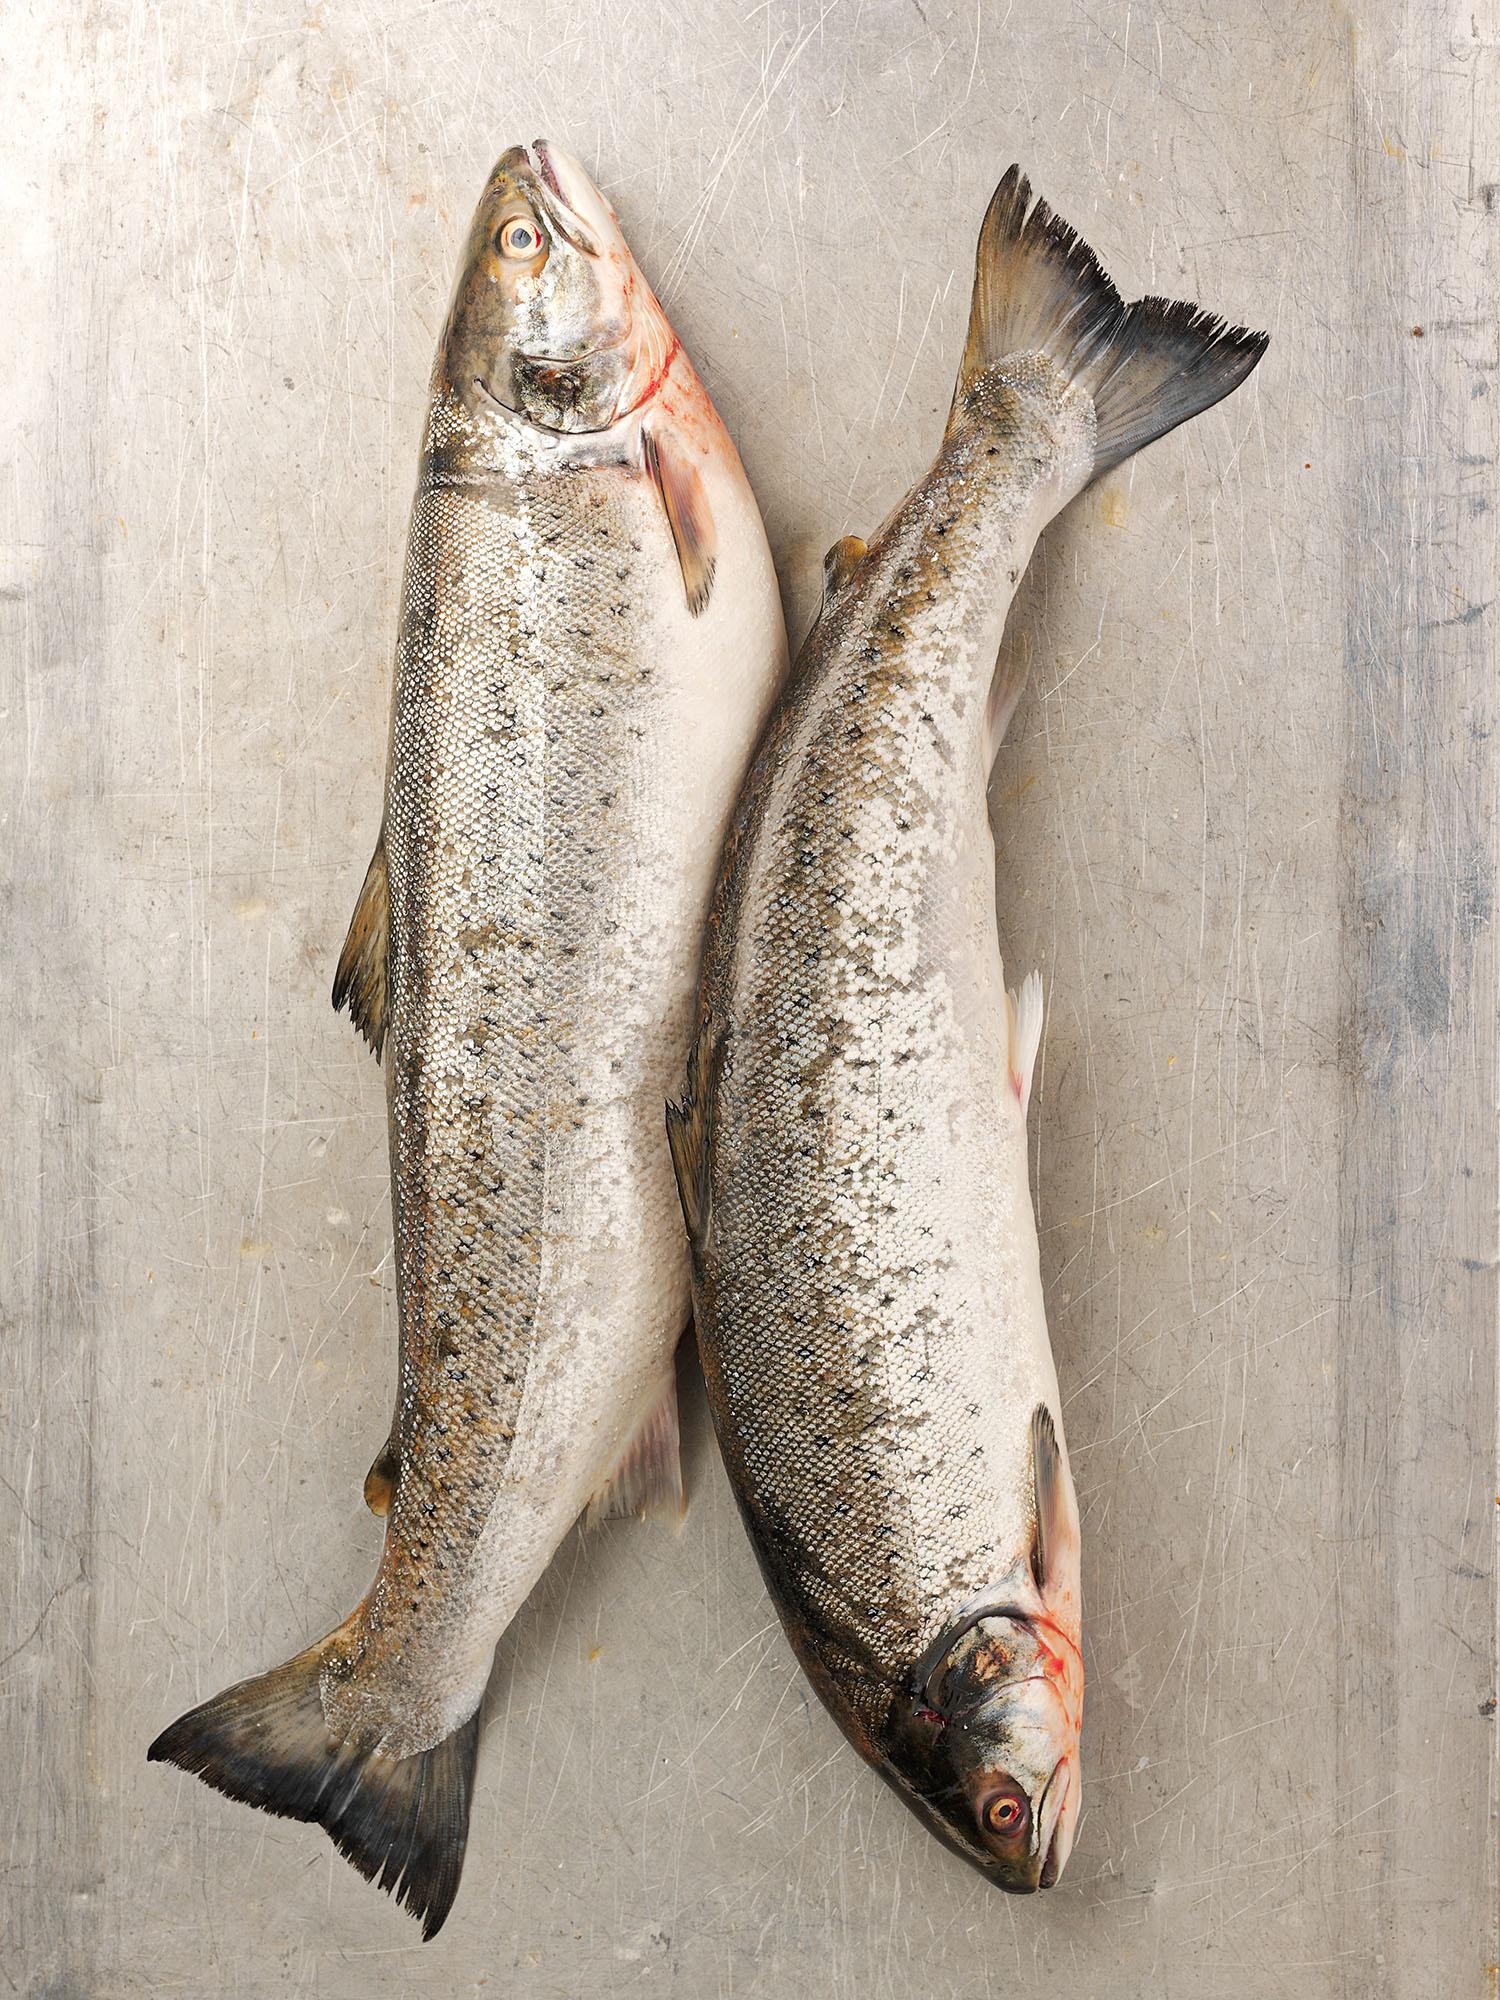 Food Photography Photographer London UK Trout Fish